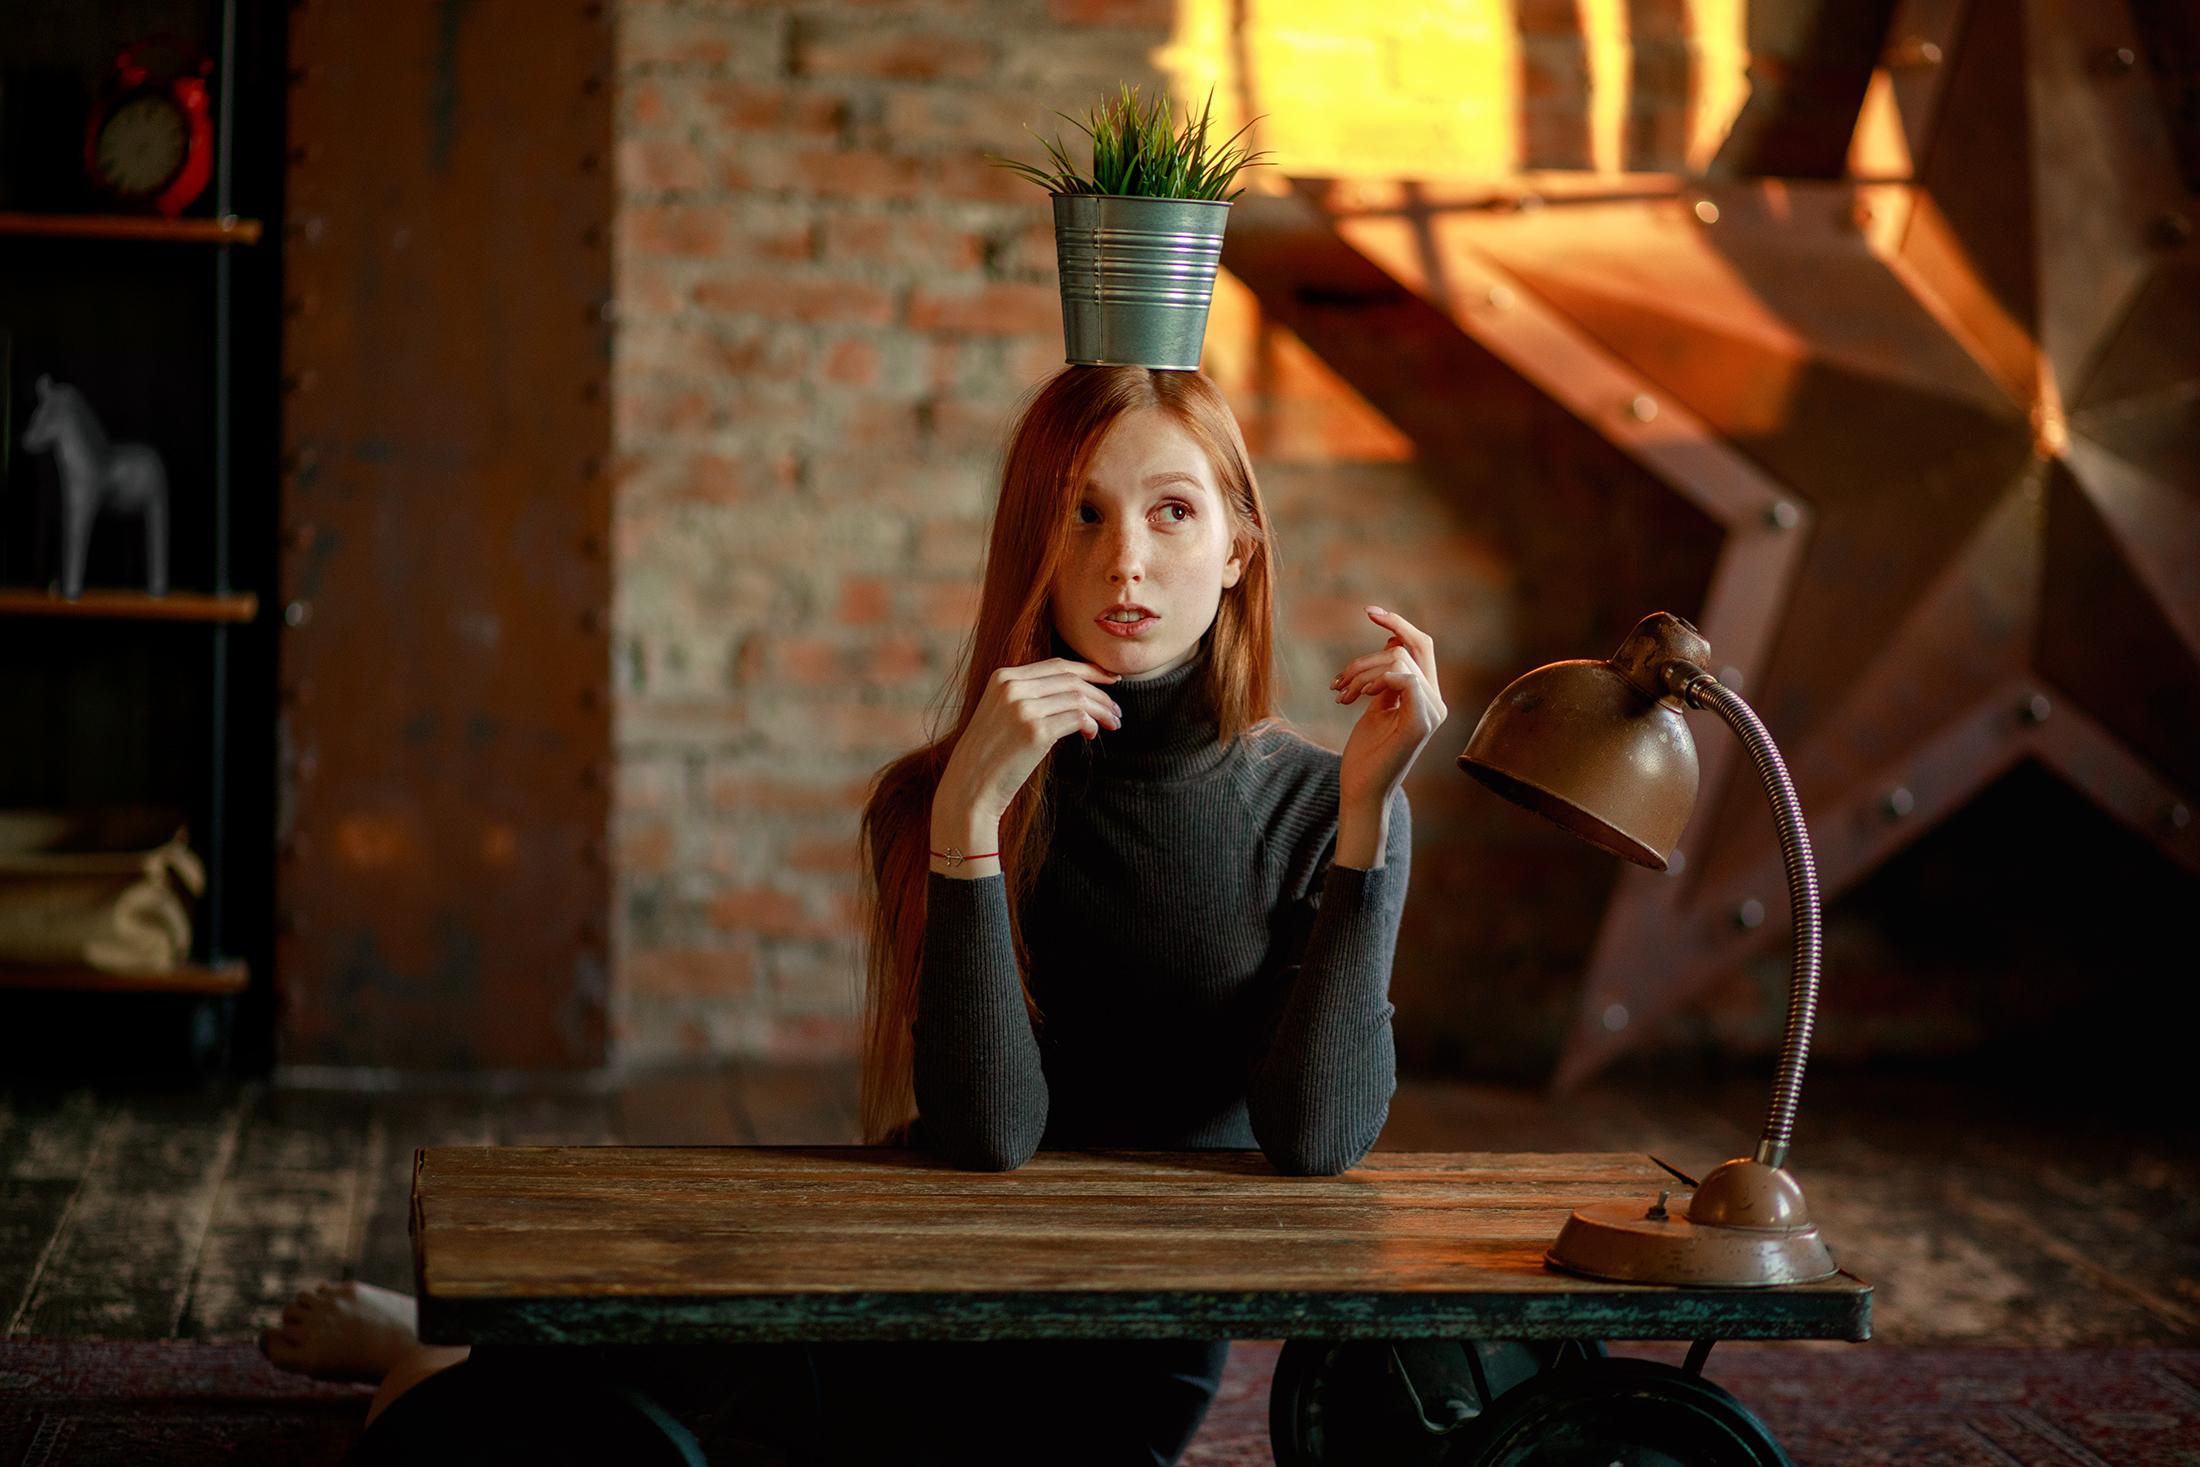 bokeh igor kuprianov on the floor dress humor model looking away indoors barefoot vases desk lamp women indoors carpets redhead plants